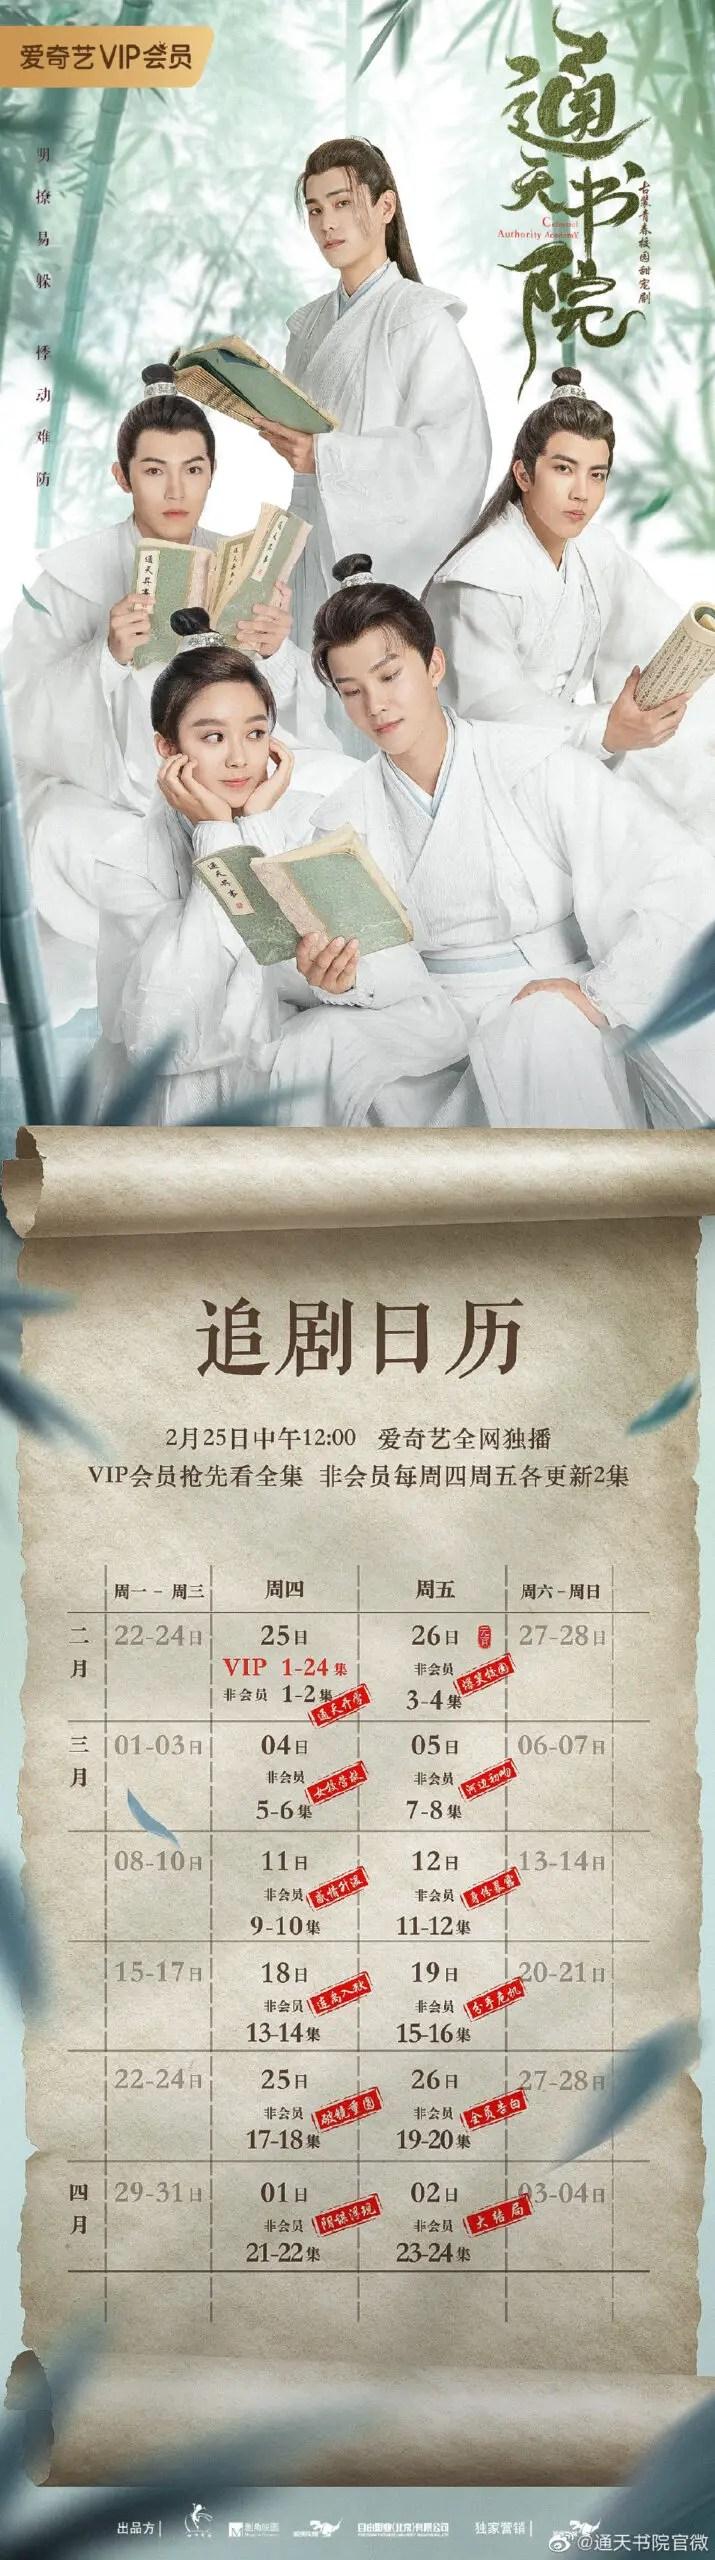 Celestial Authority Academy Chinese Drama Airing Calendar